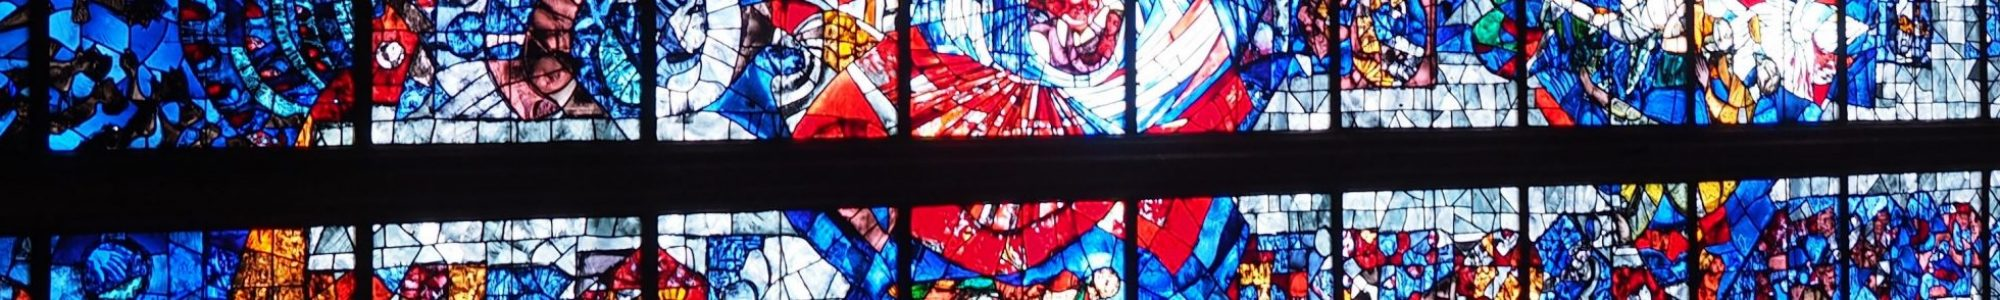 window-glass-color-blue-church-lighting-913097-pxherecropped.com